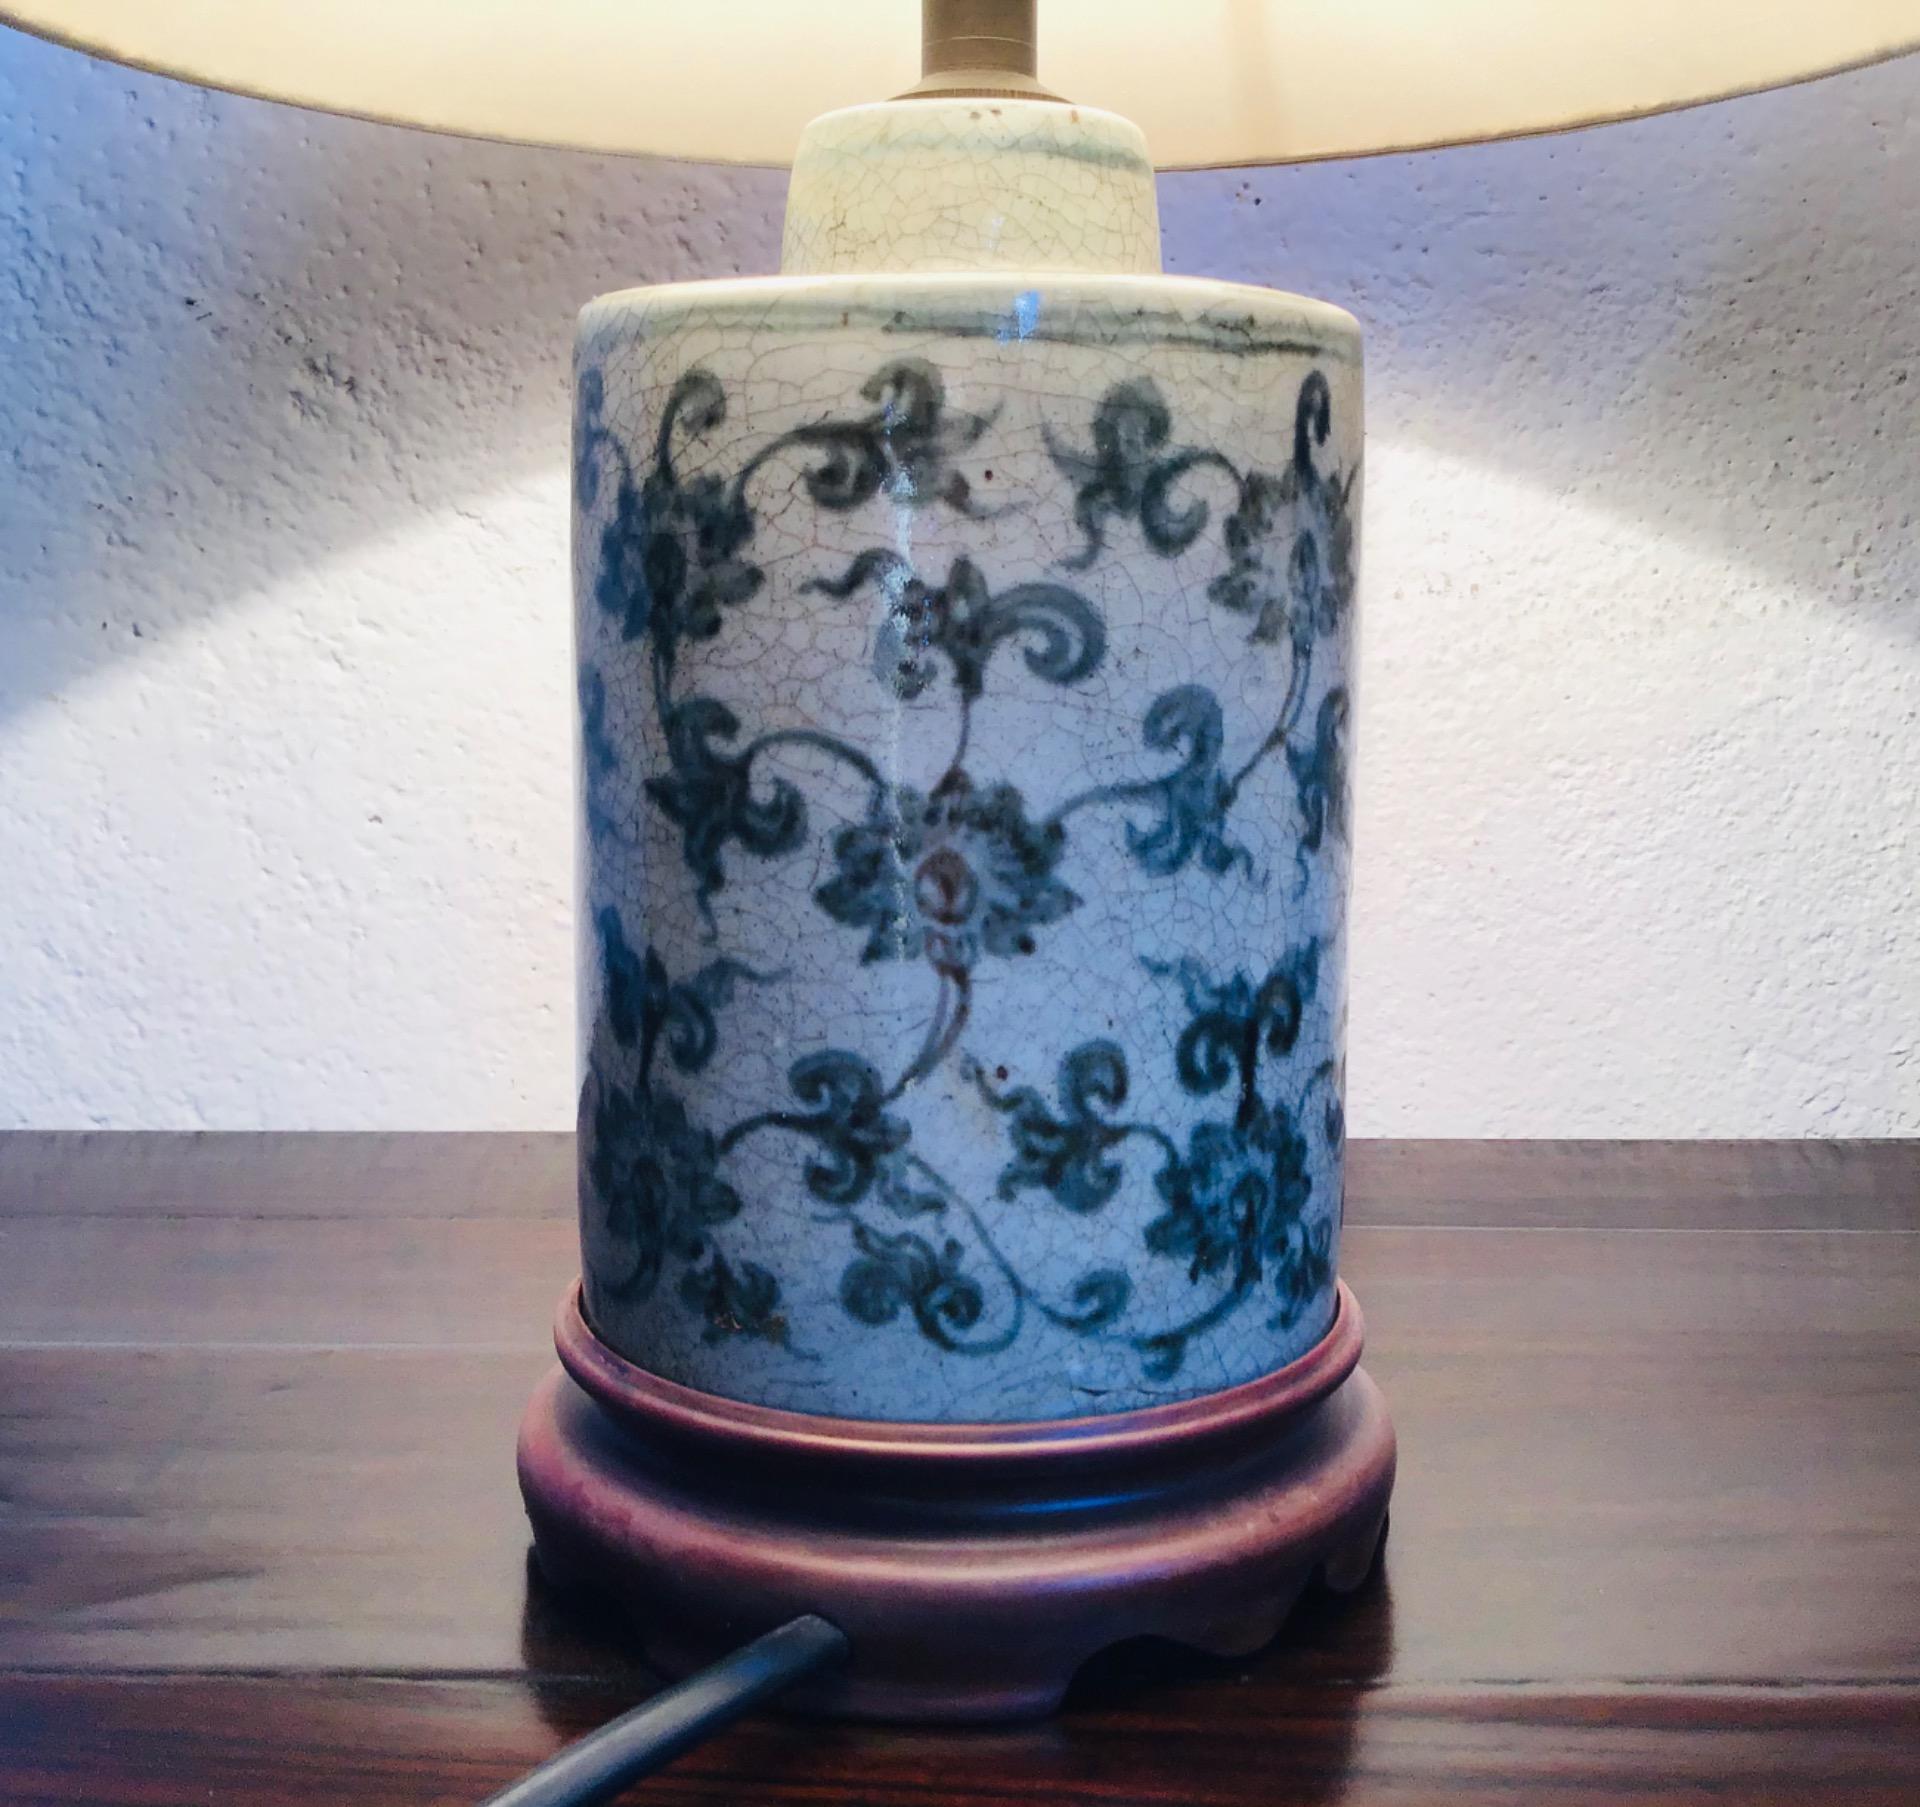 thumb2|Coppia lampade